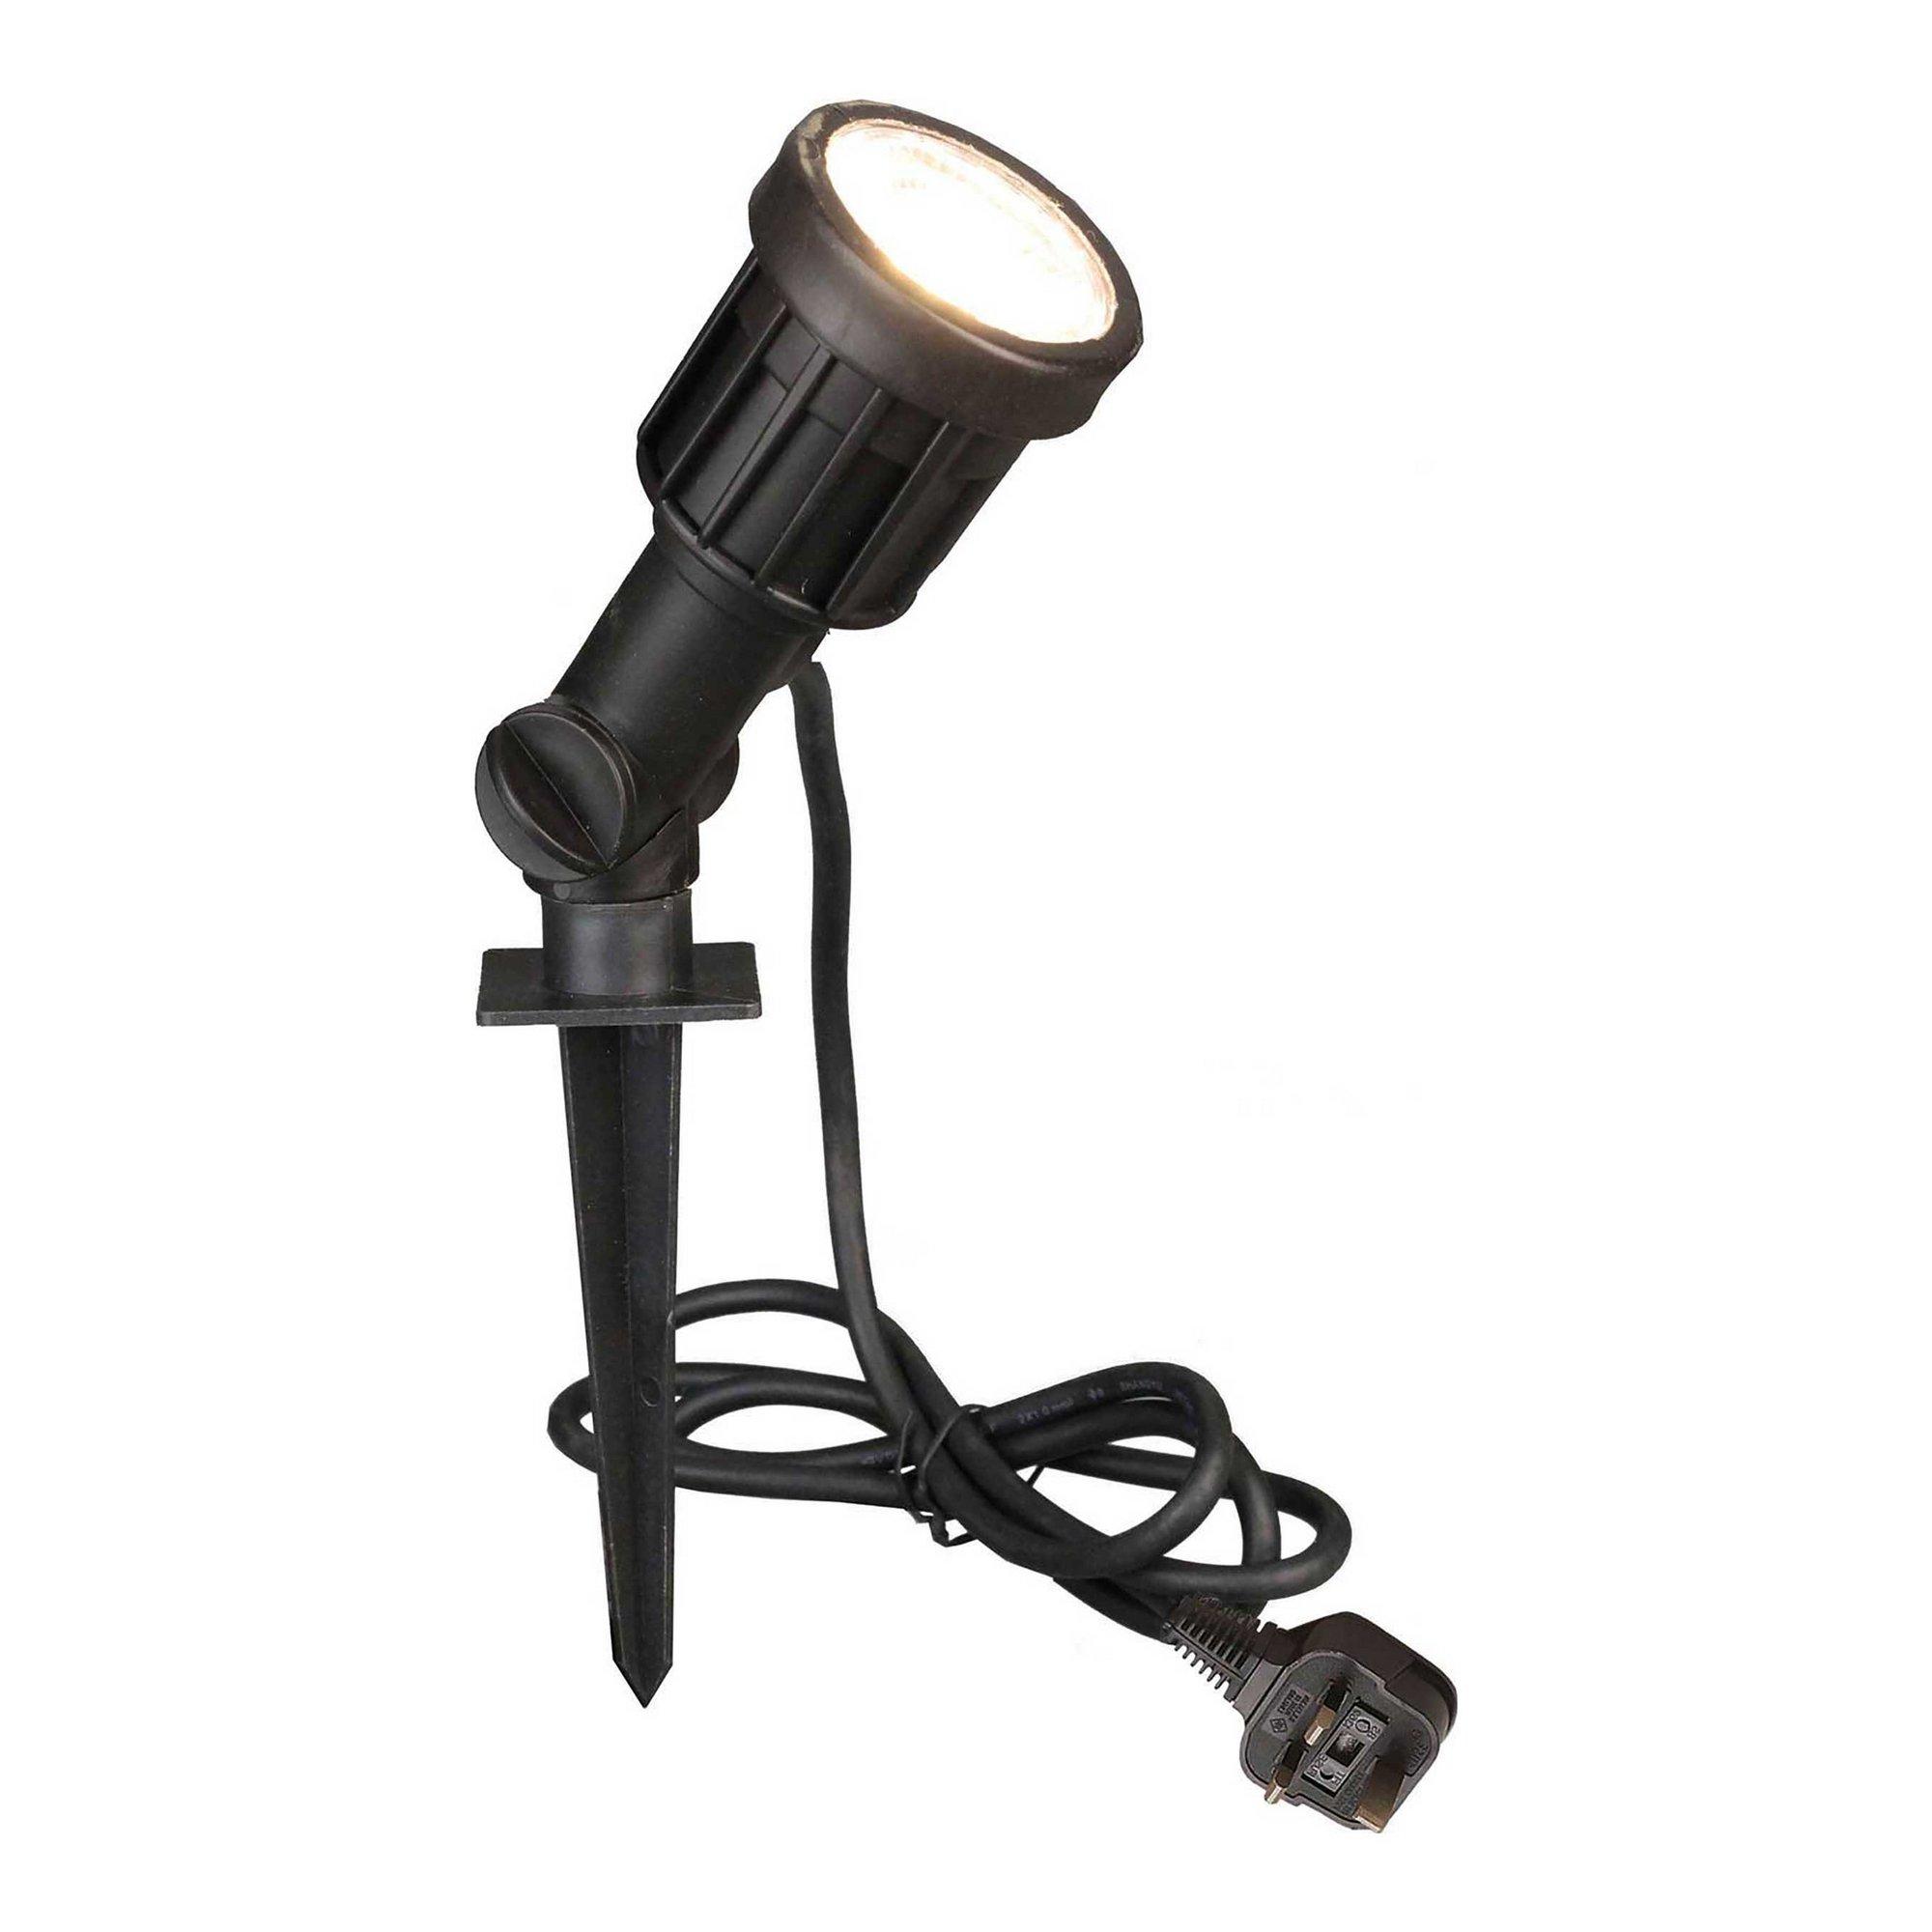 Image of 230v Mini Dominica Spot Light